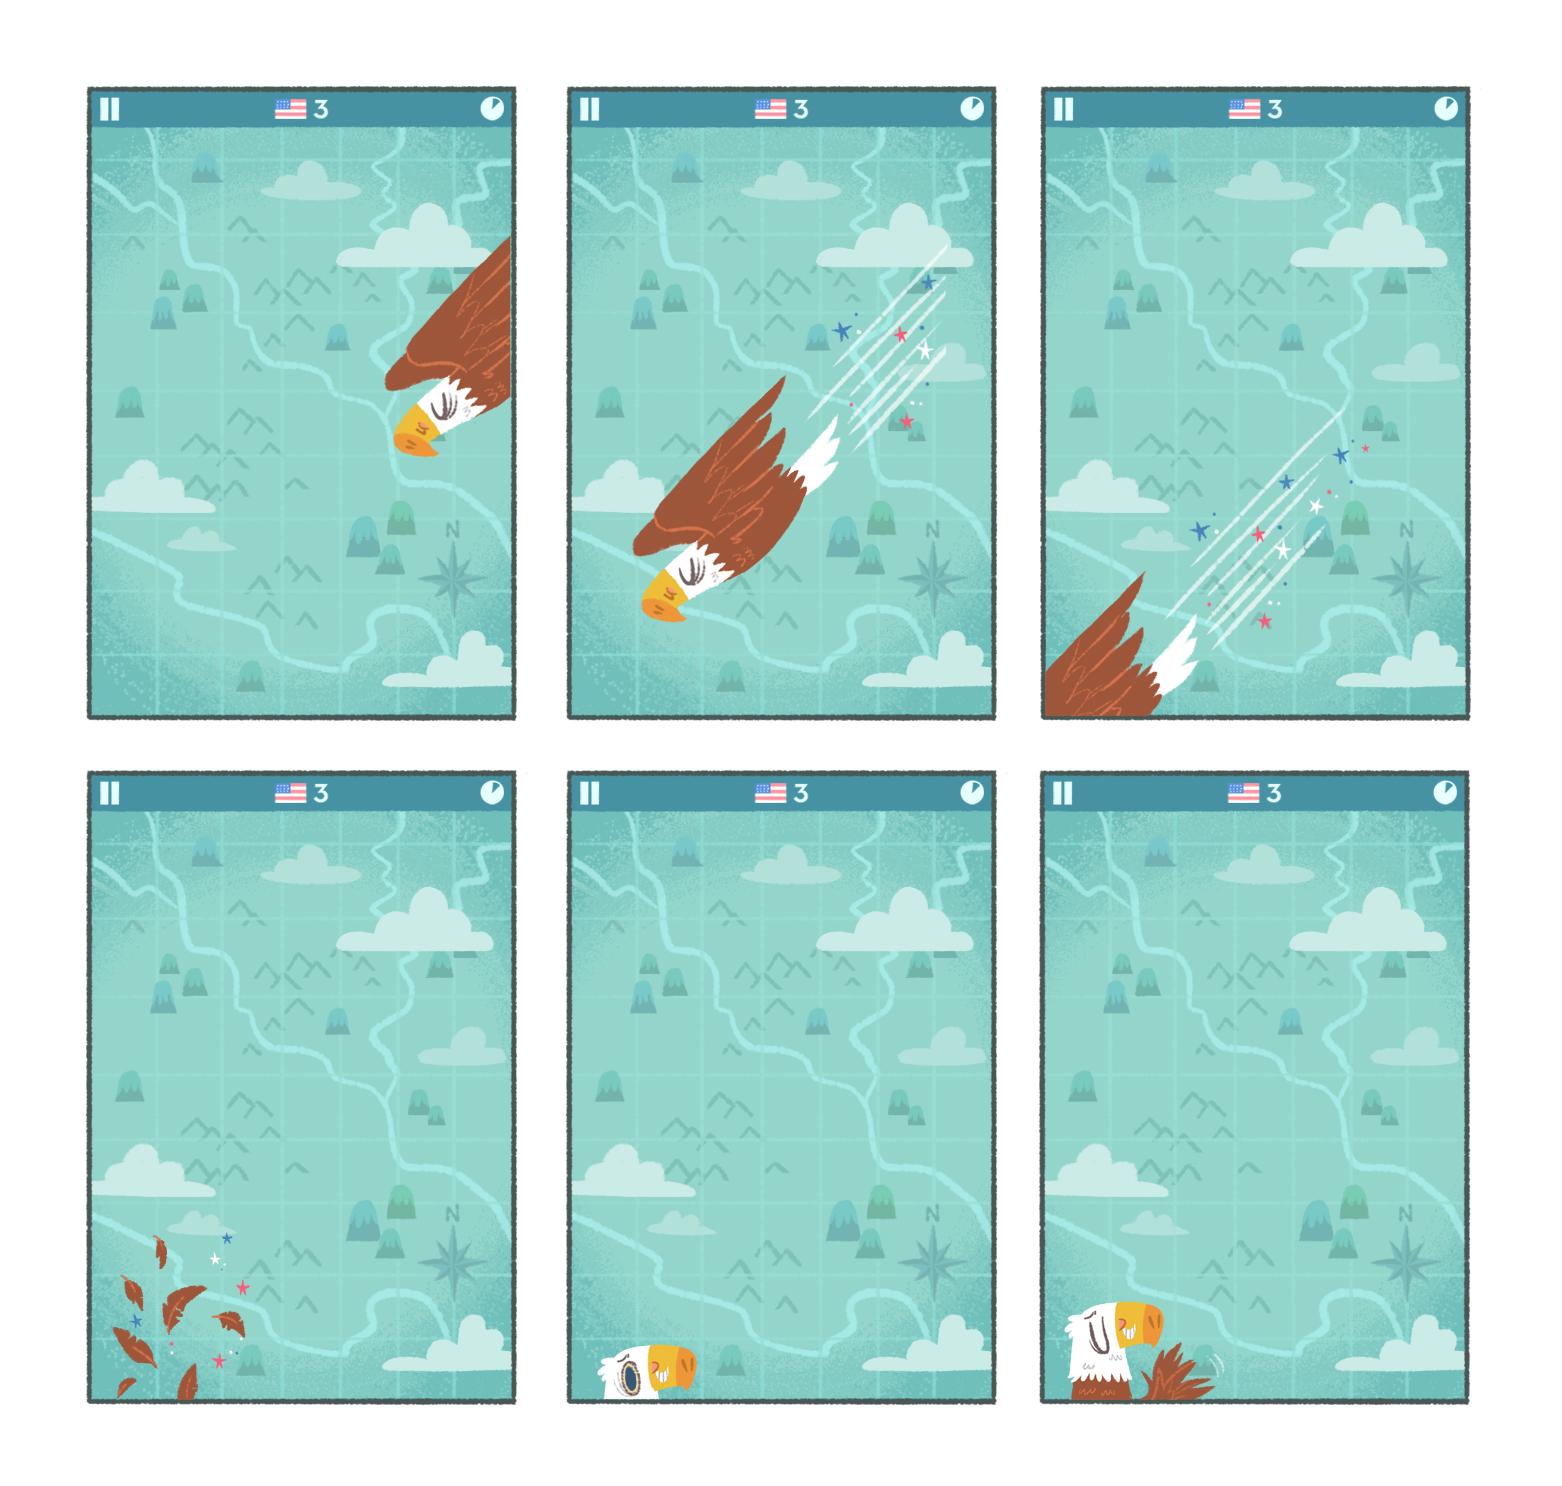 Game Intro Storyboard